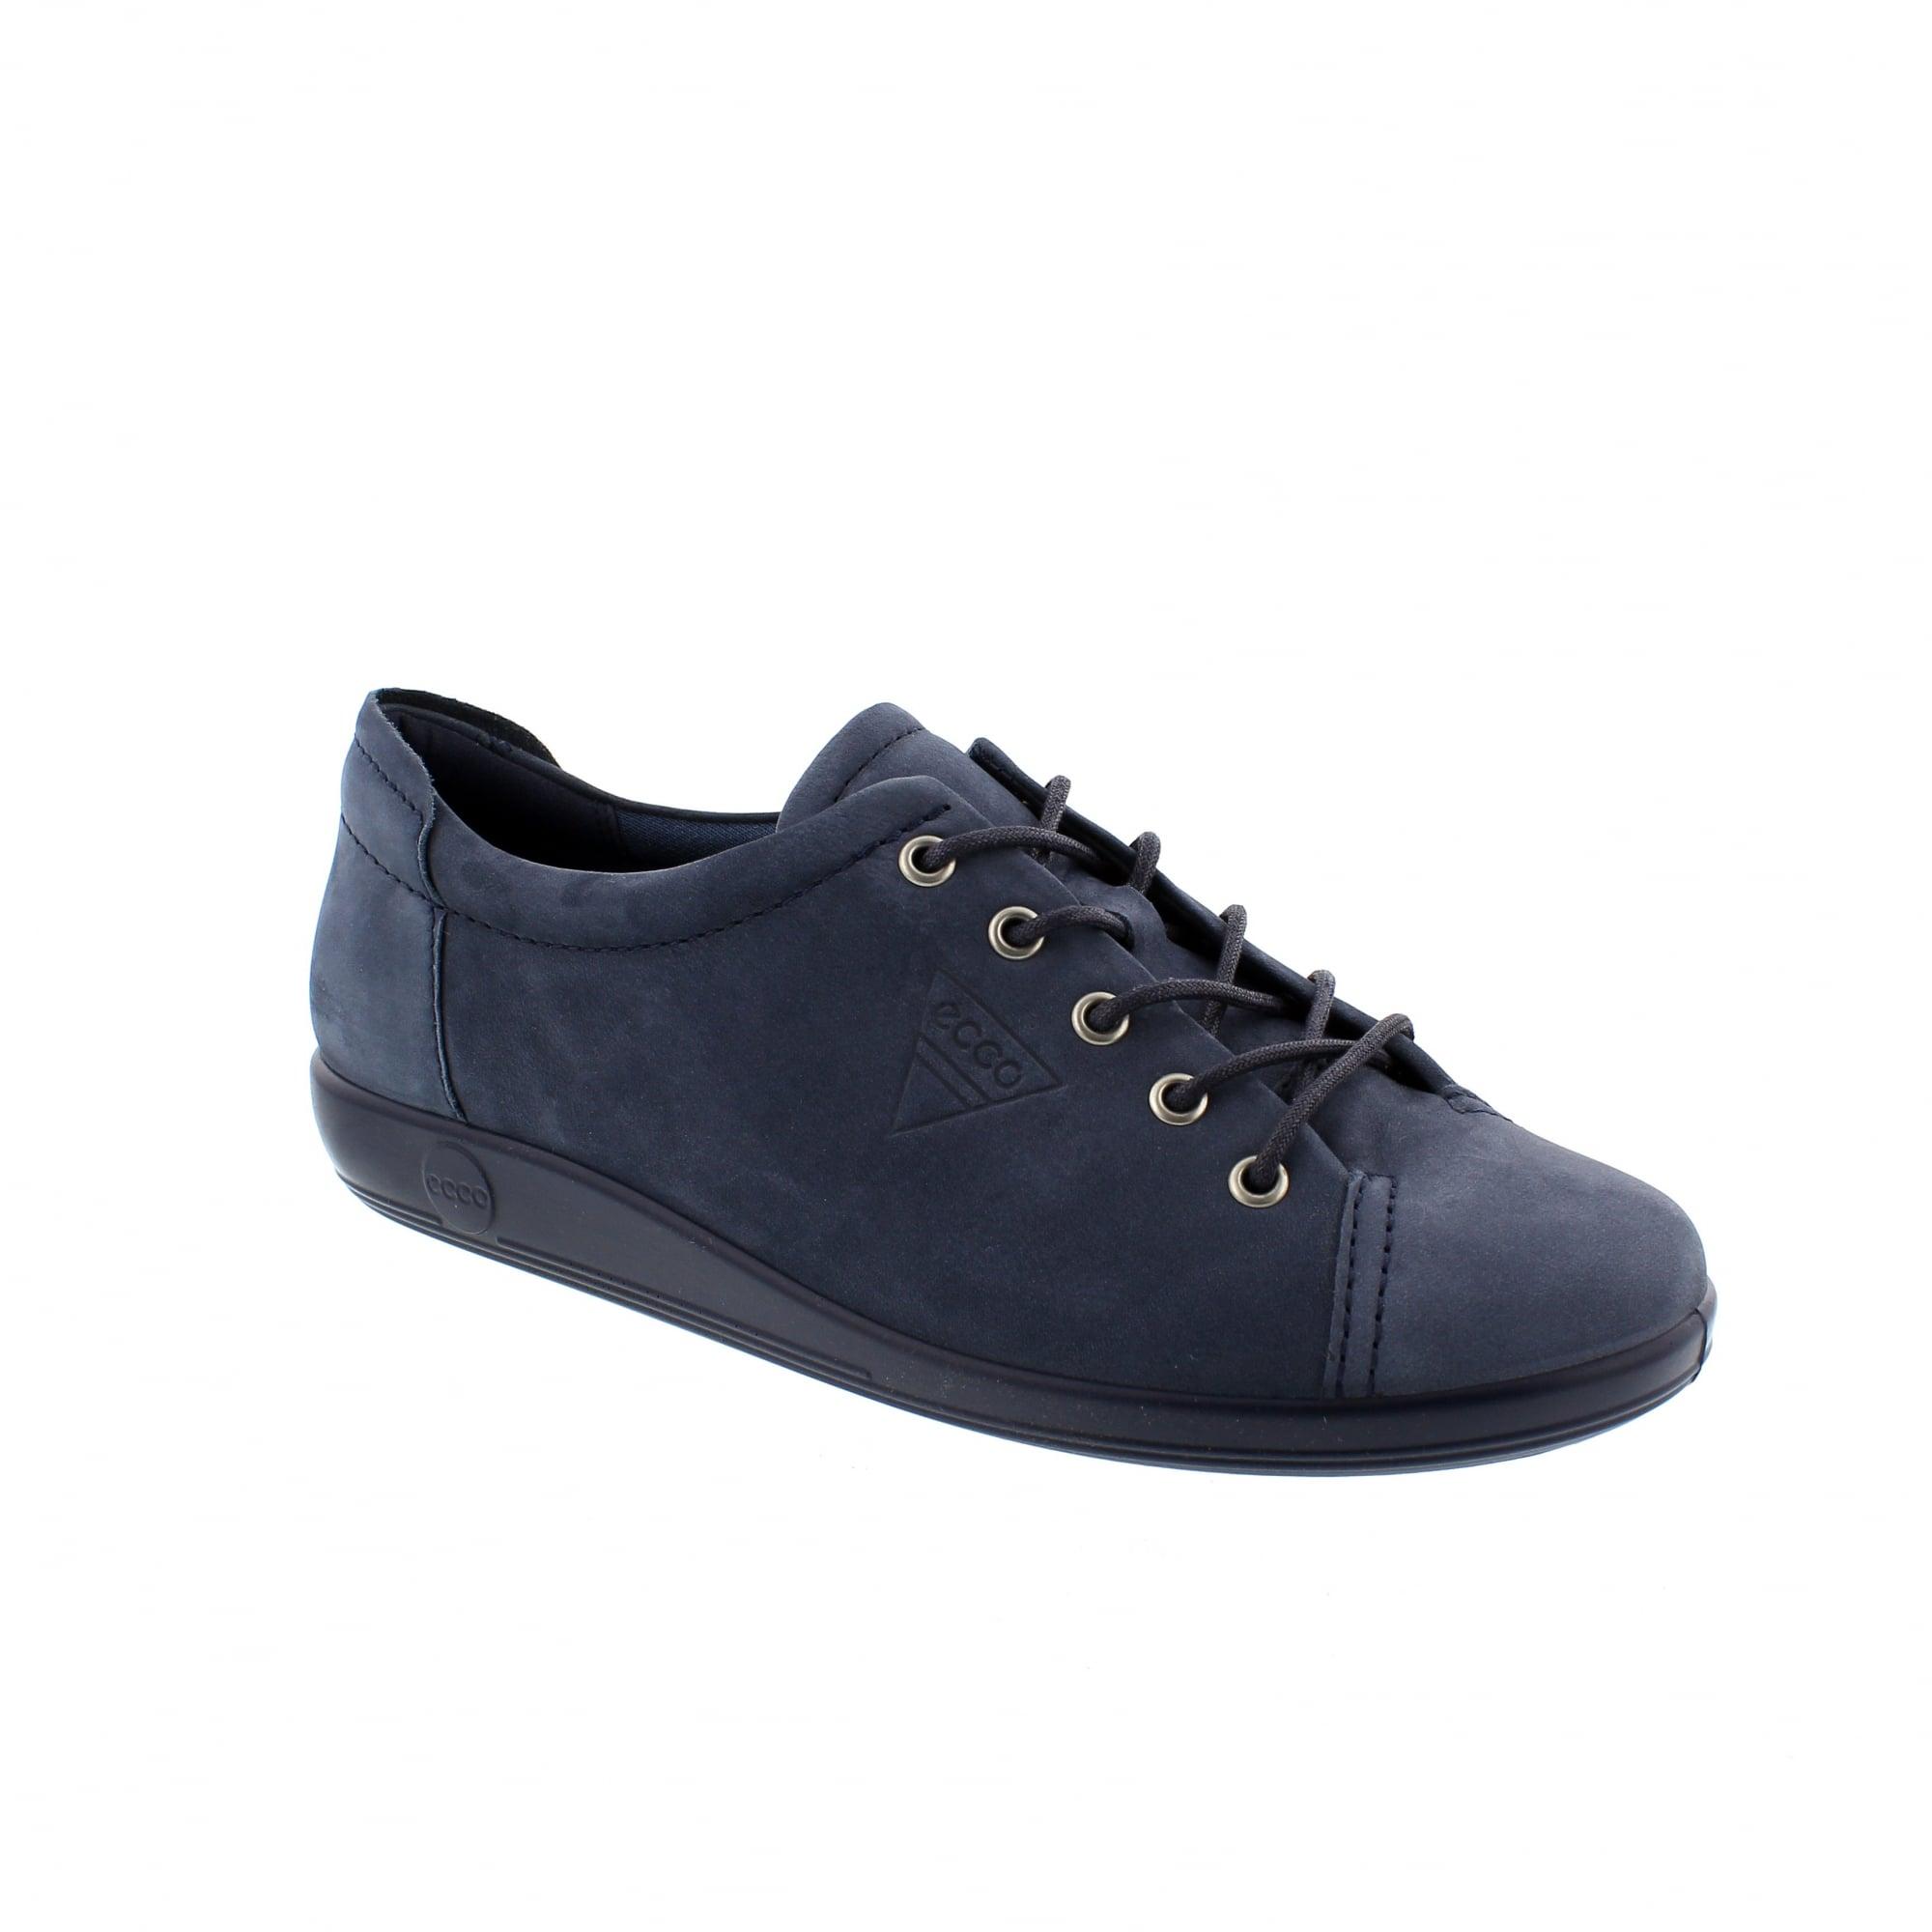 b4d451b9f4da6 Ecco Soft 2.0 | 206503-02038 - Womens from Rogerson Shoes UK